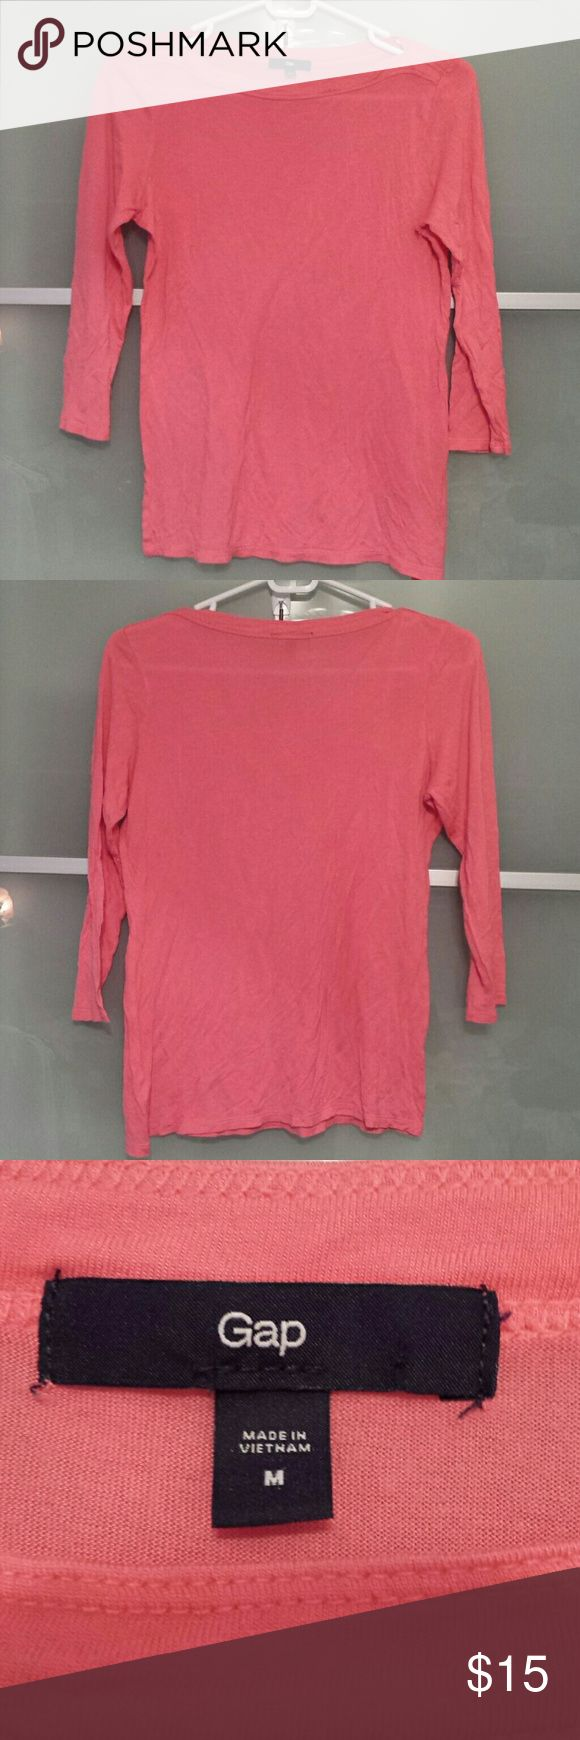 Boat neck gap top Pink 3/4 sleeve gap top. Boat neckline which is very flattering. GAP Tops